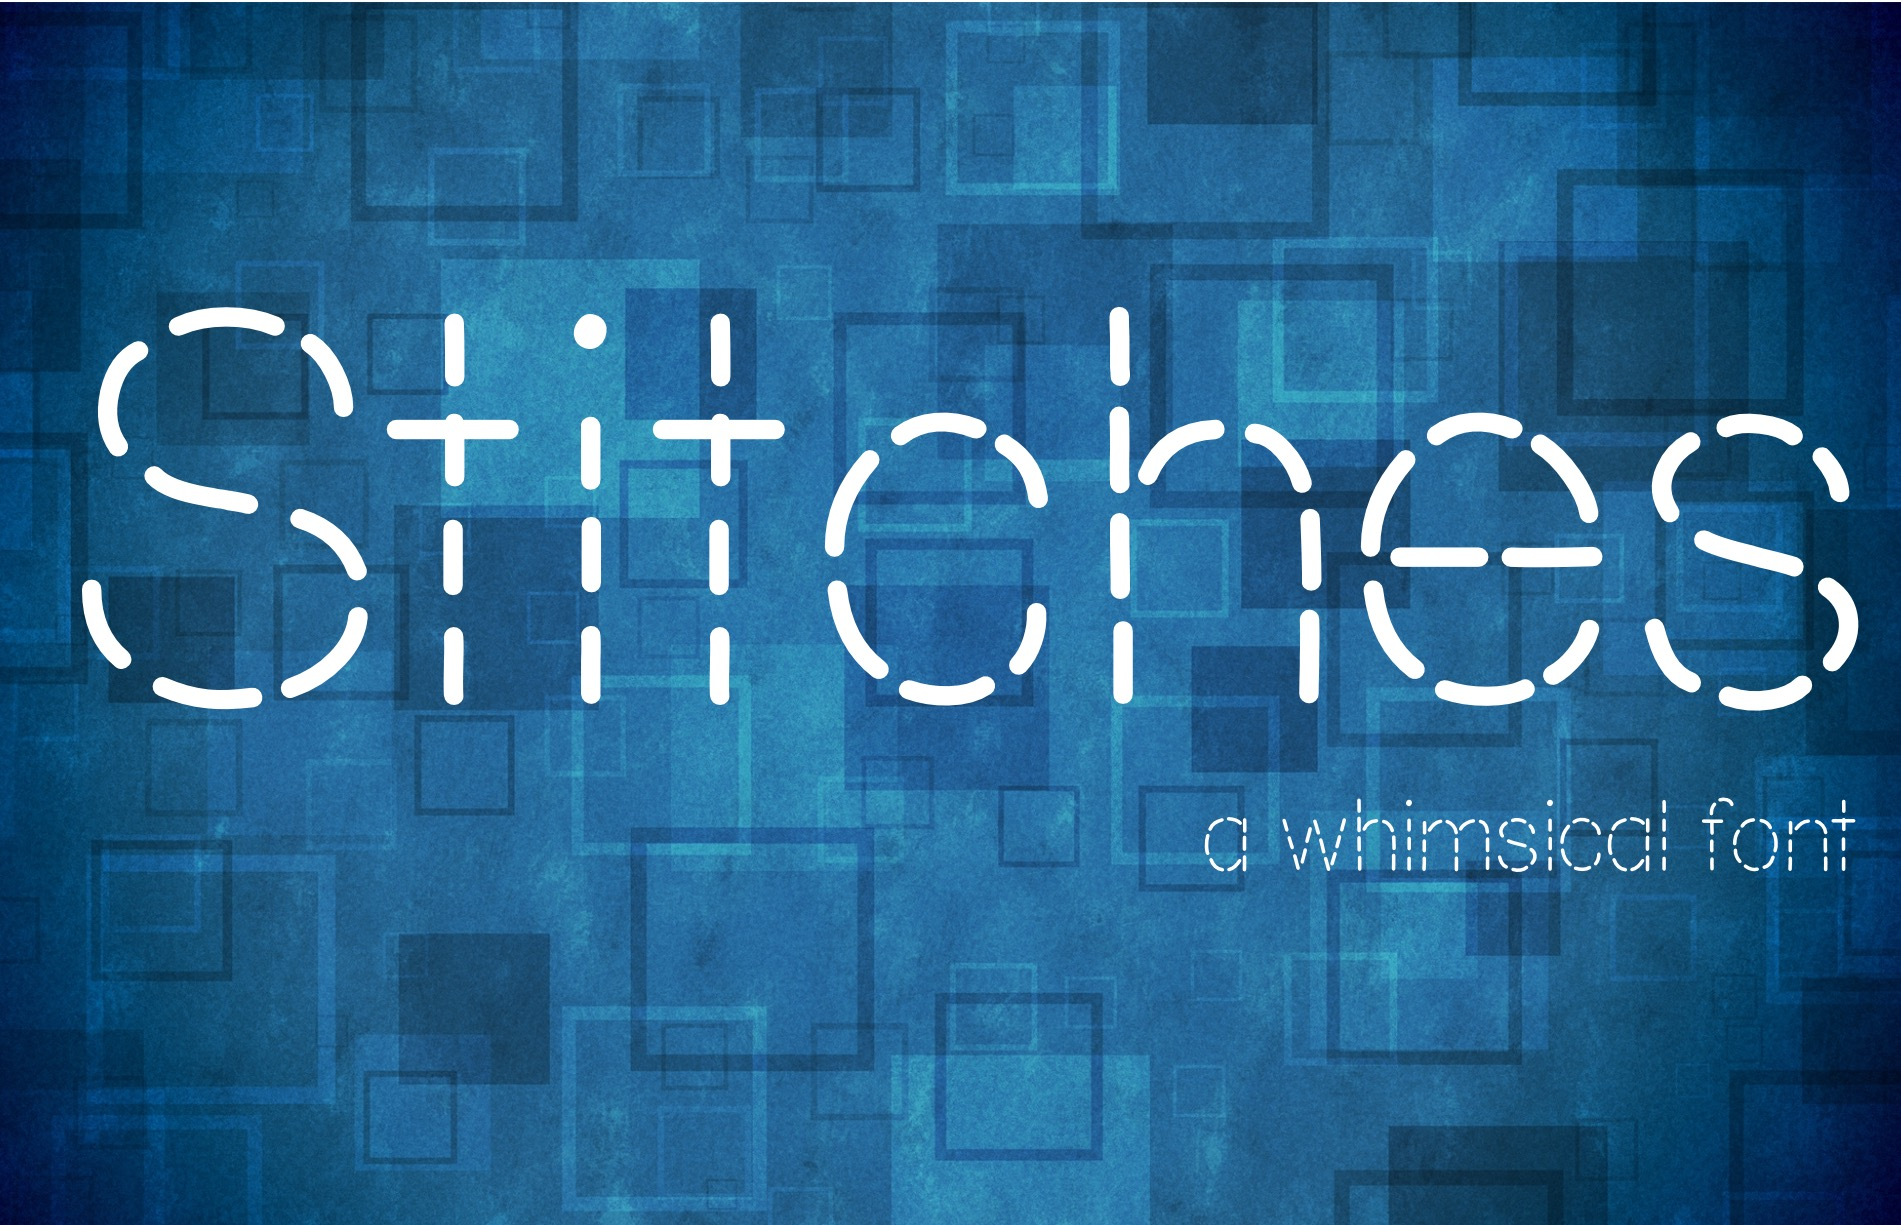 Stitches example image 1